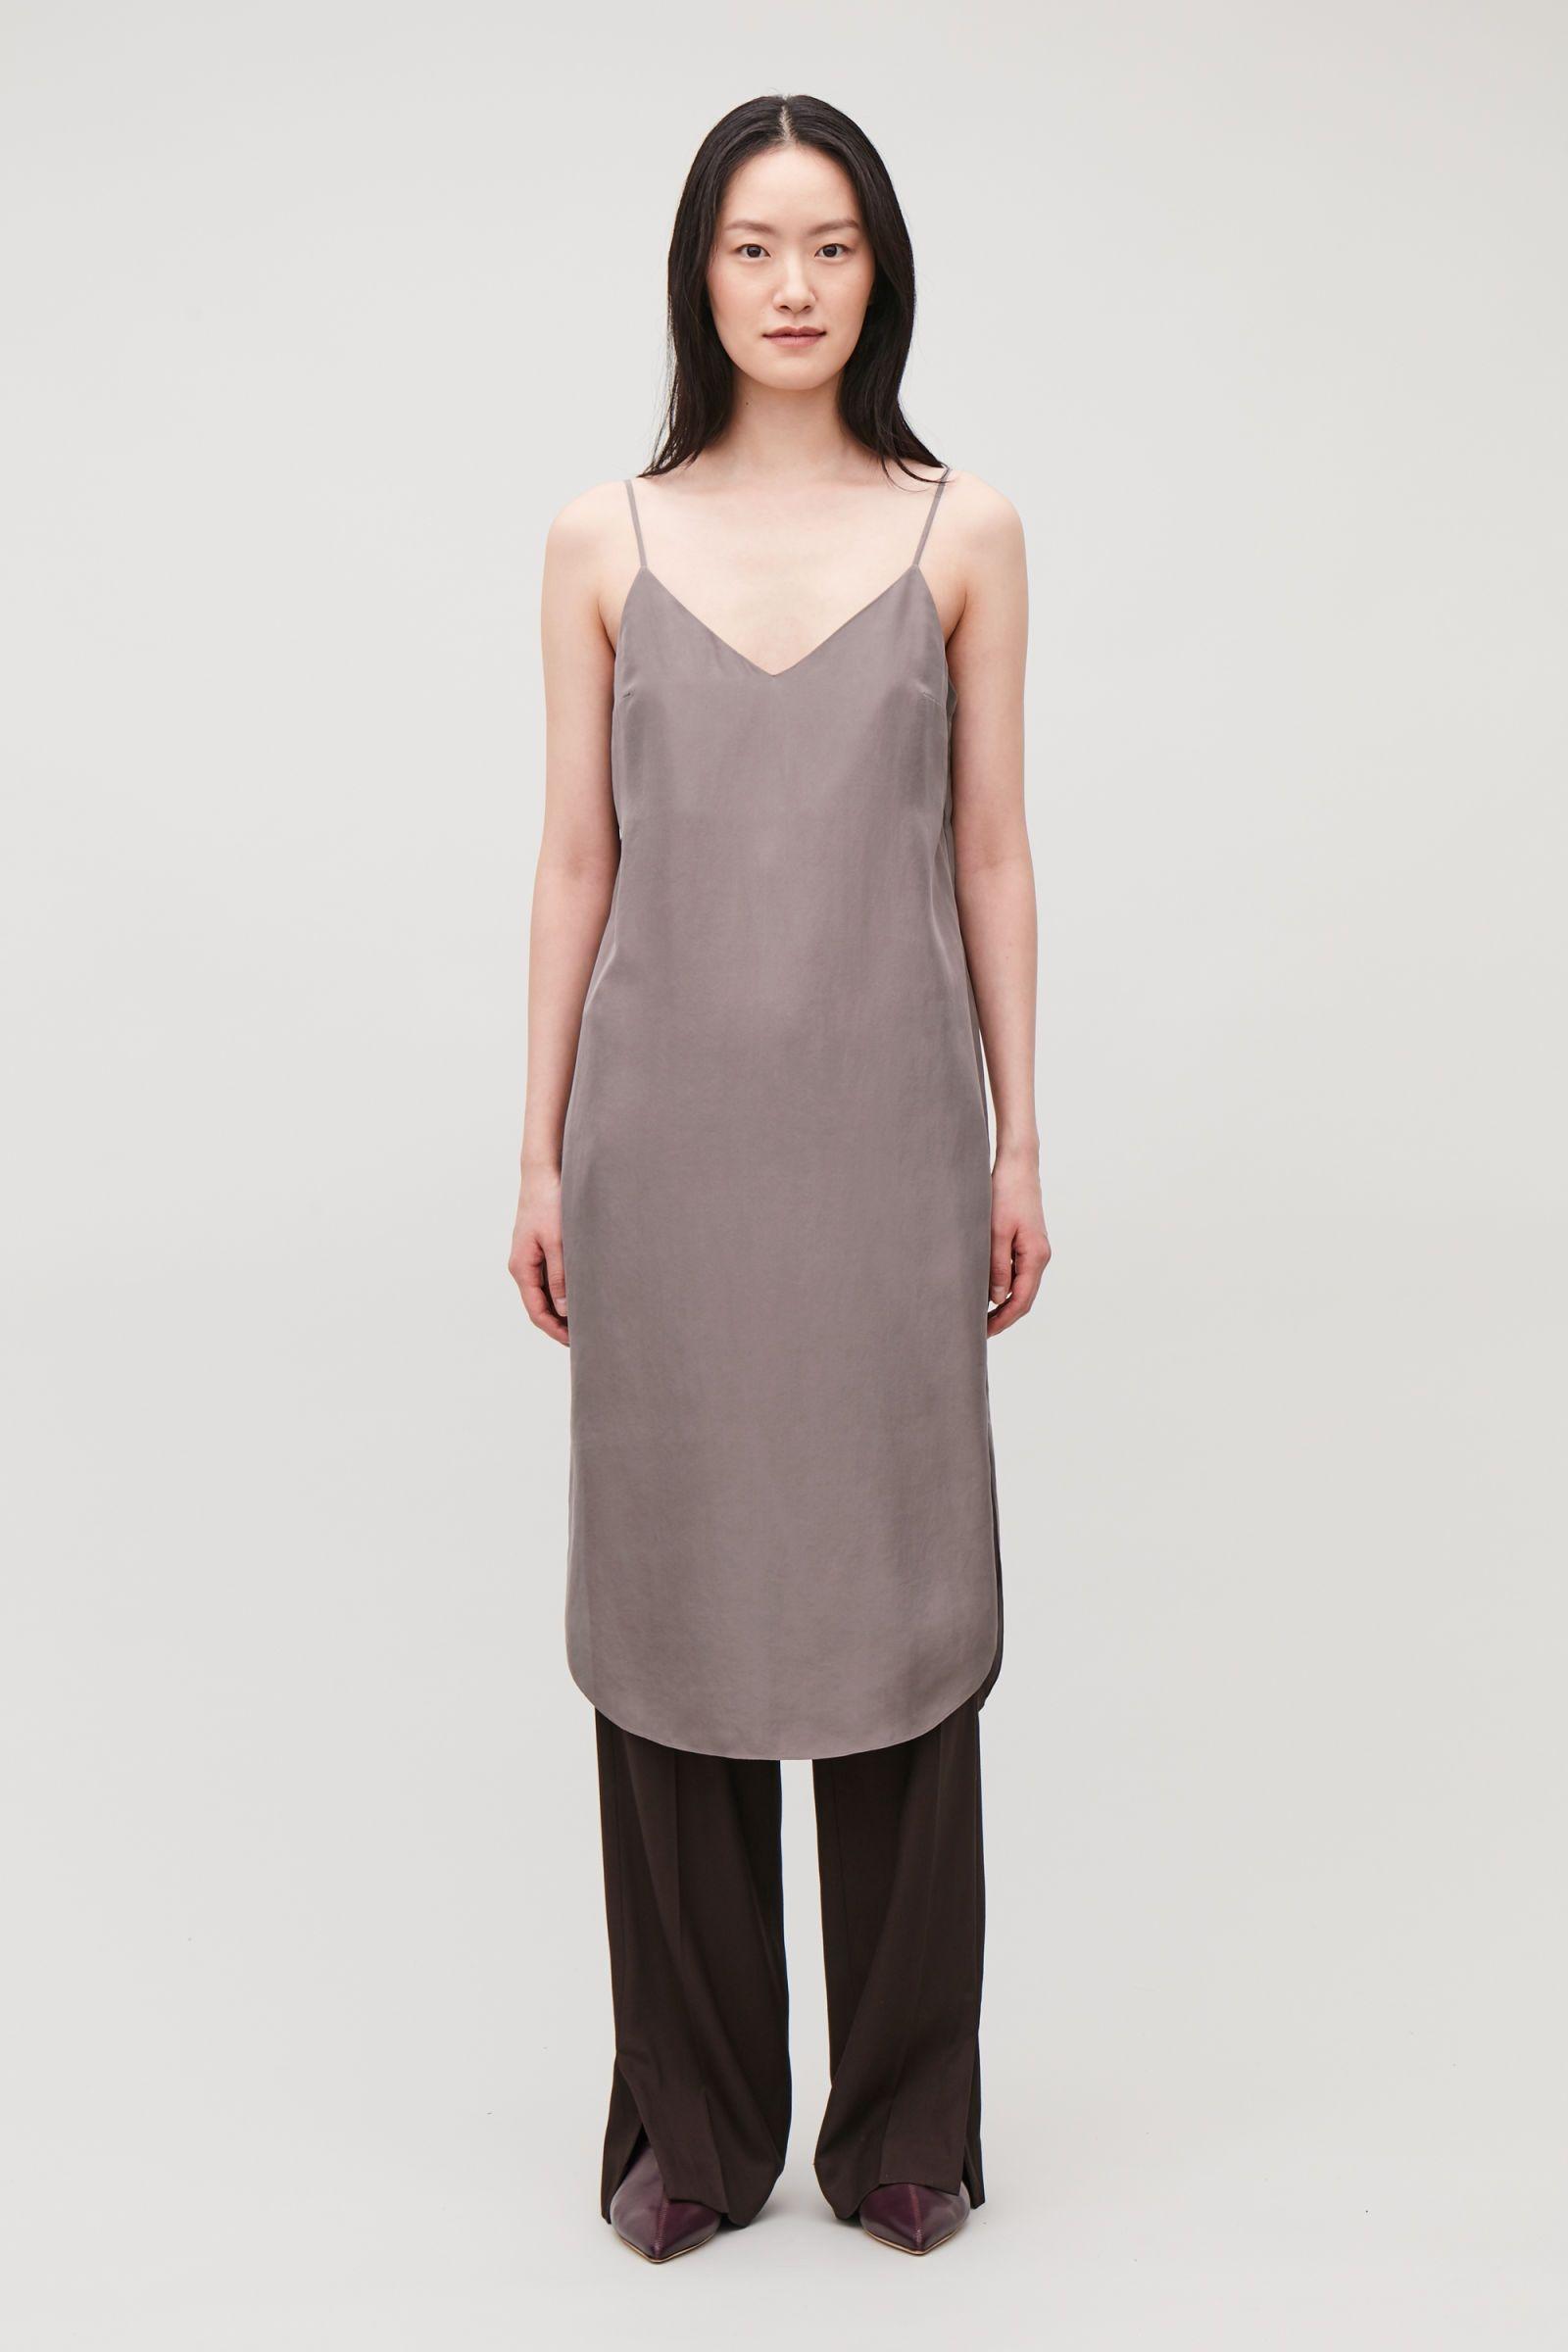 SILK SLIP DRESS Ganache Dresses COS